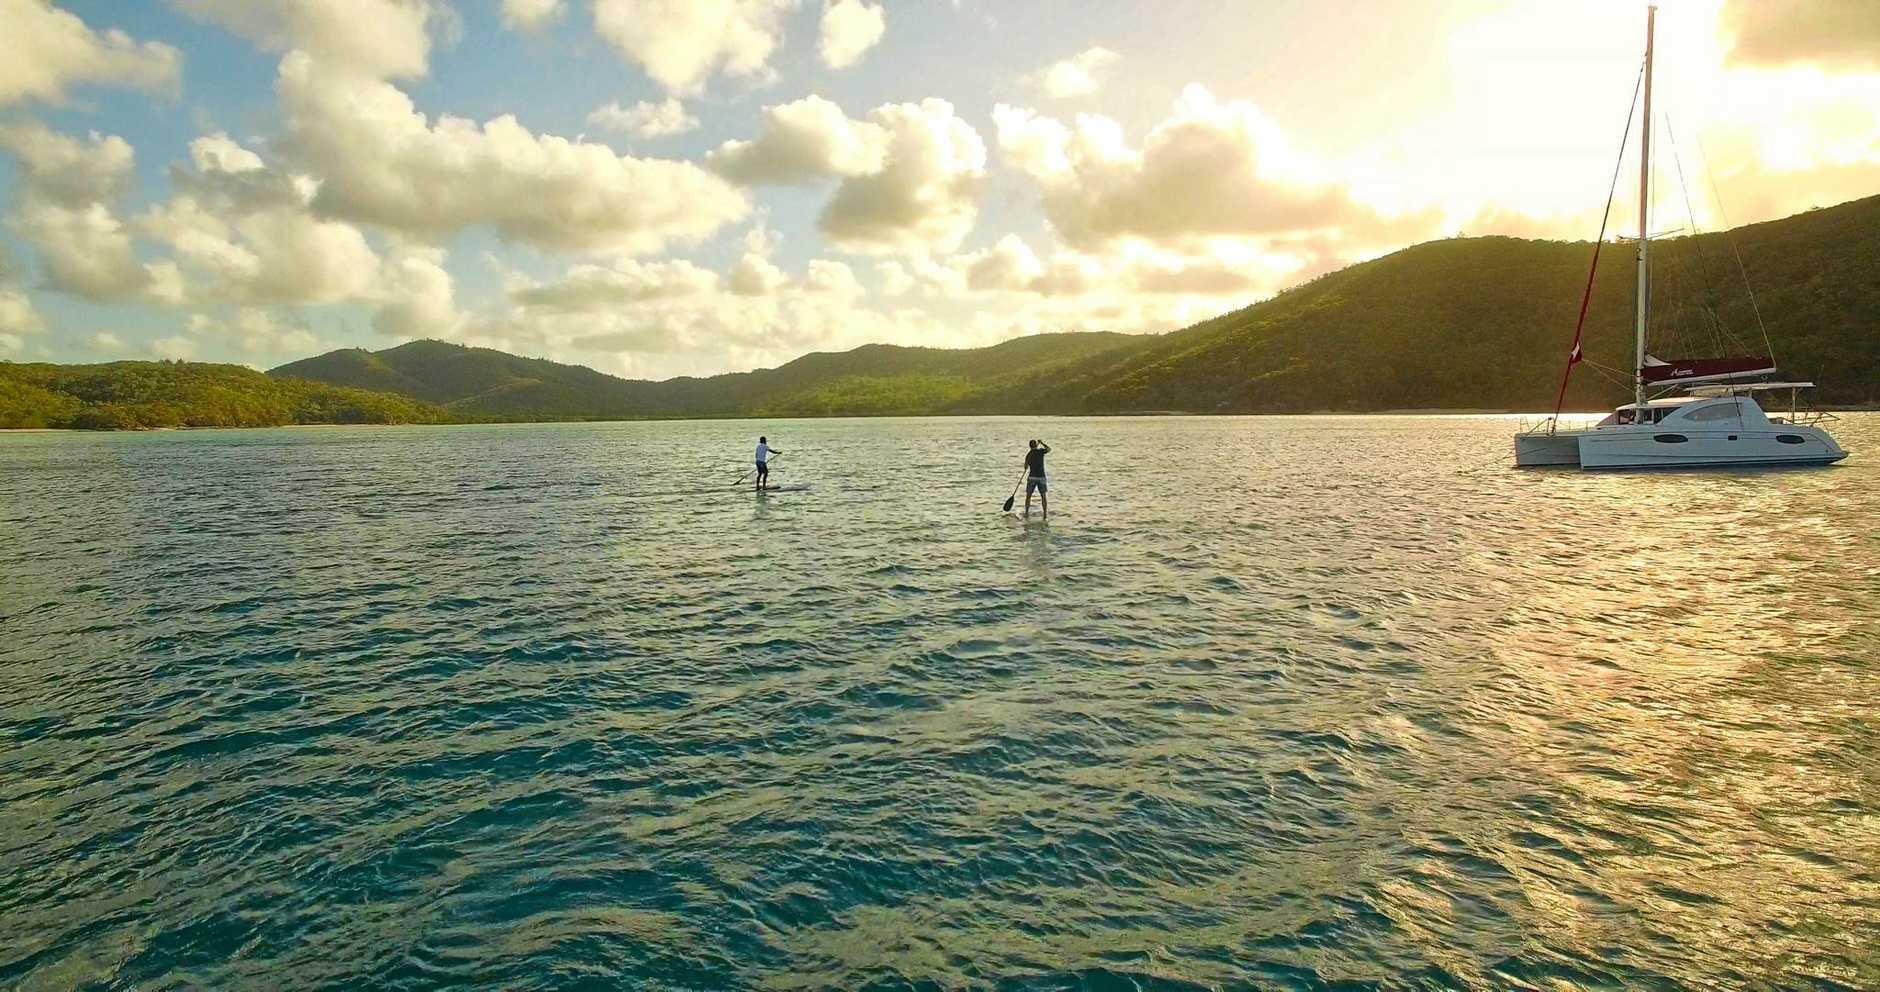 Hayden Quinn and Dan Churchill standup paddleboarding in the Whitsundays.